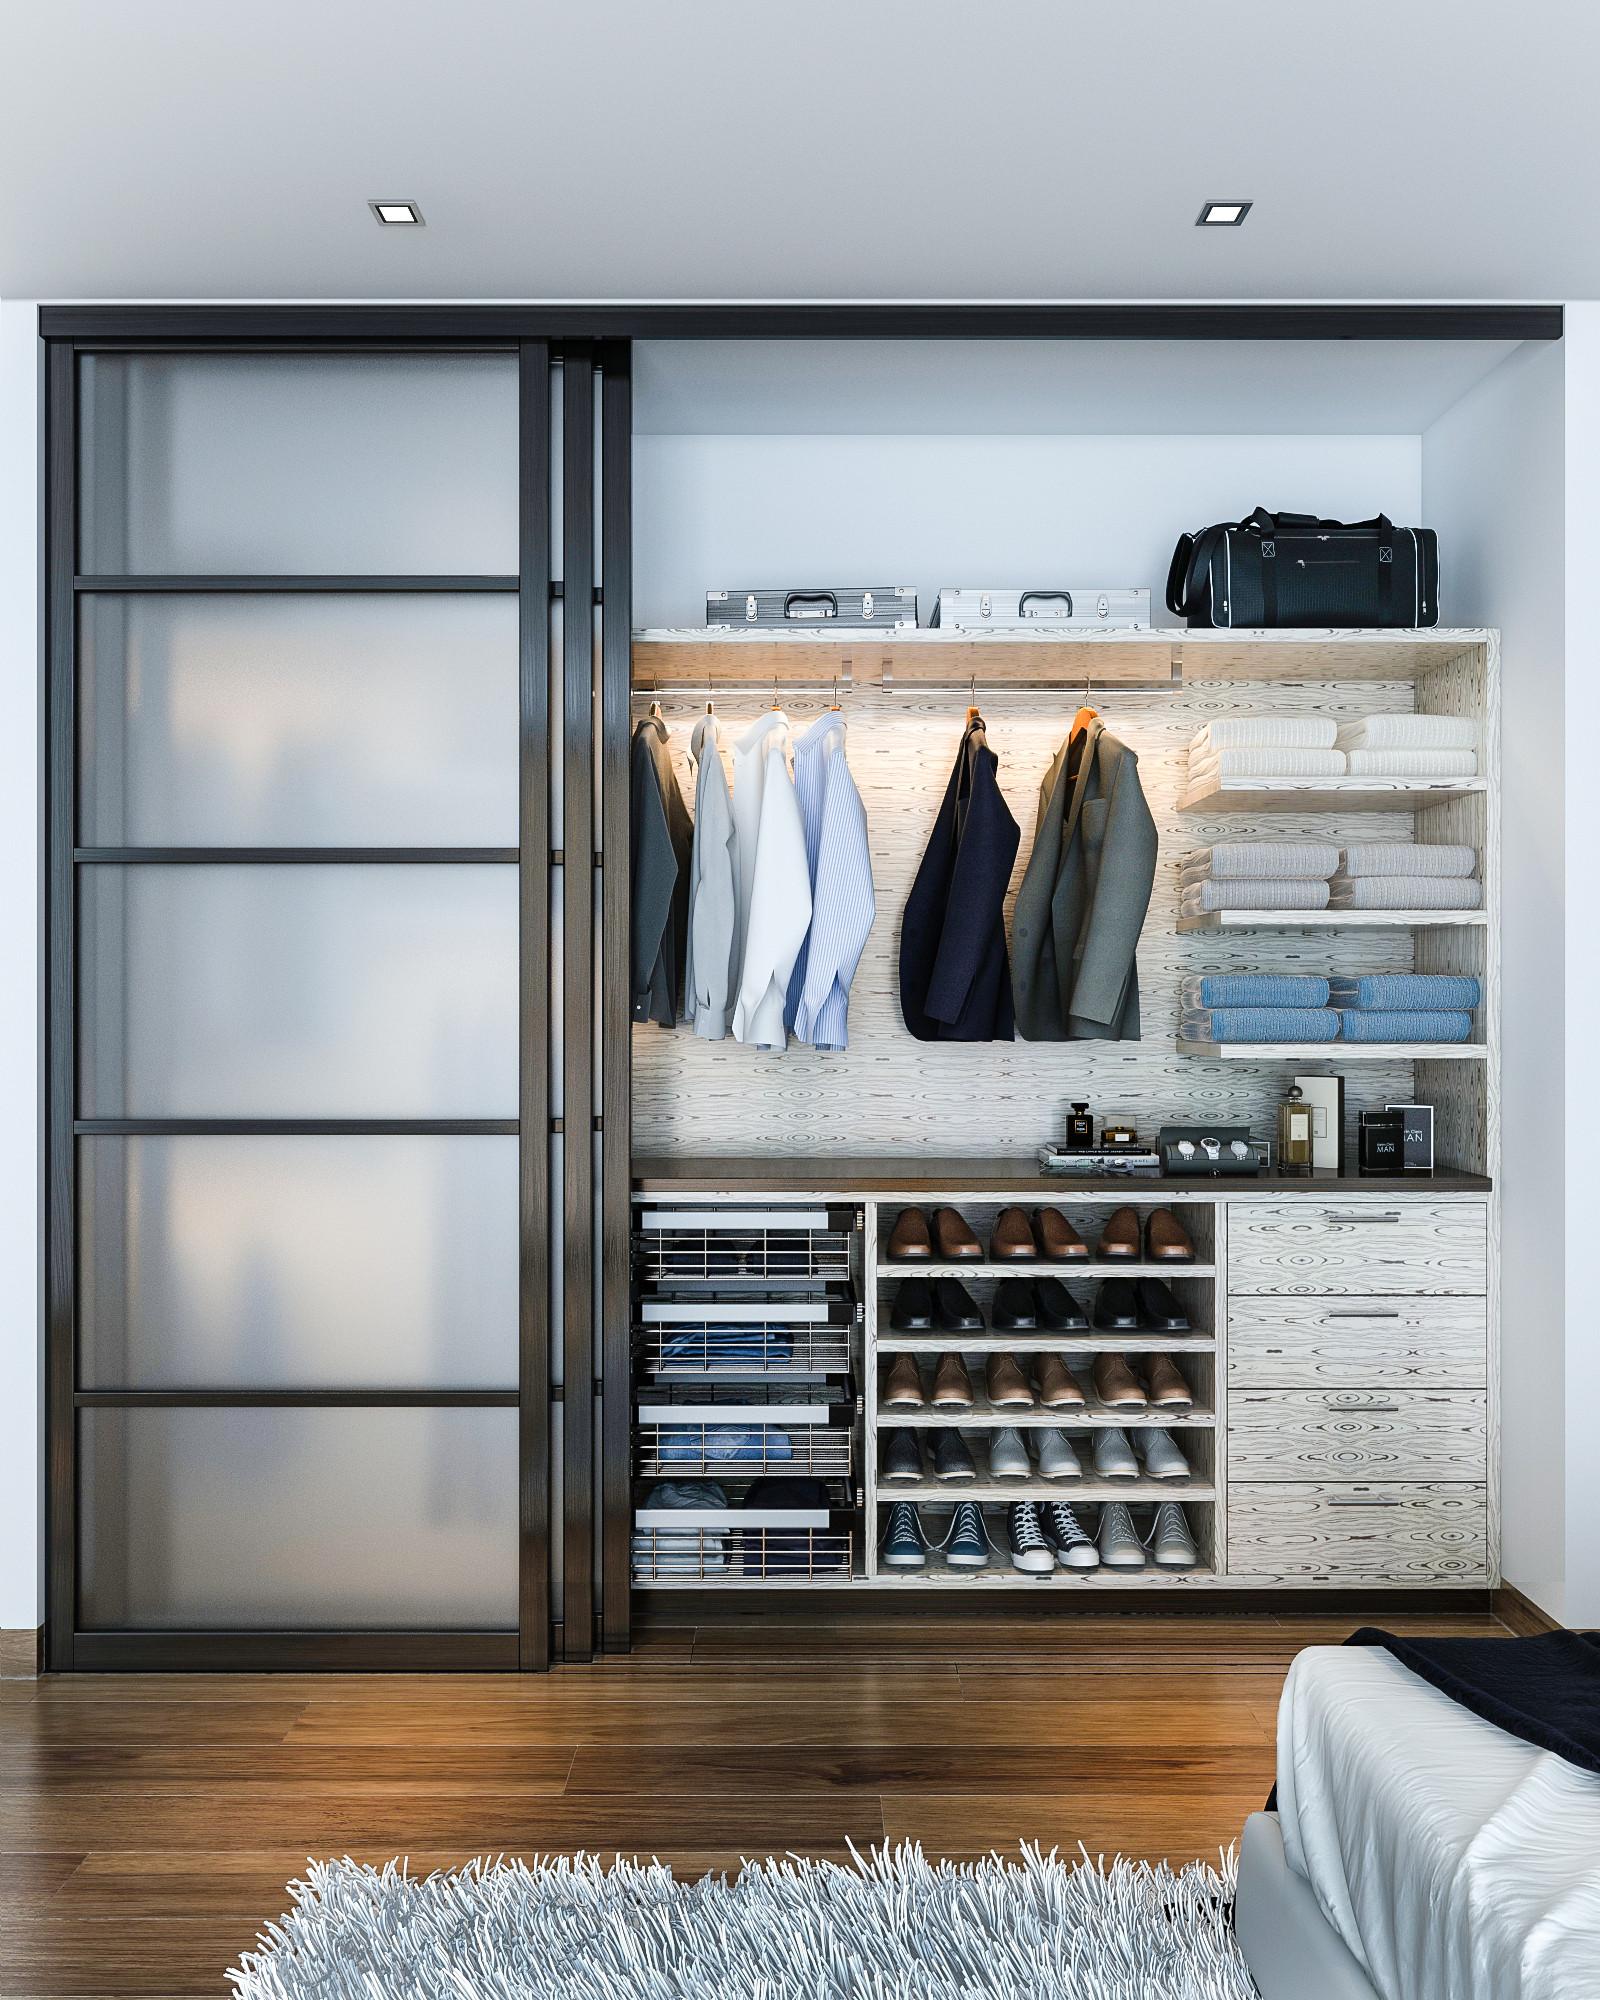 75 Beautiful Modern Closet Pictures Ideas March 2021 Houzz